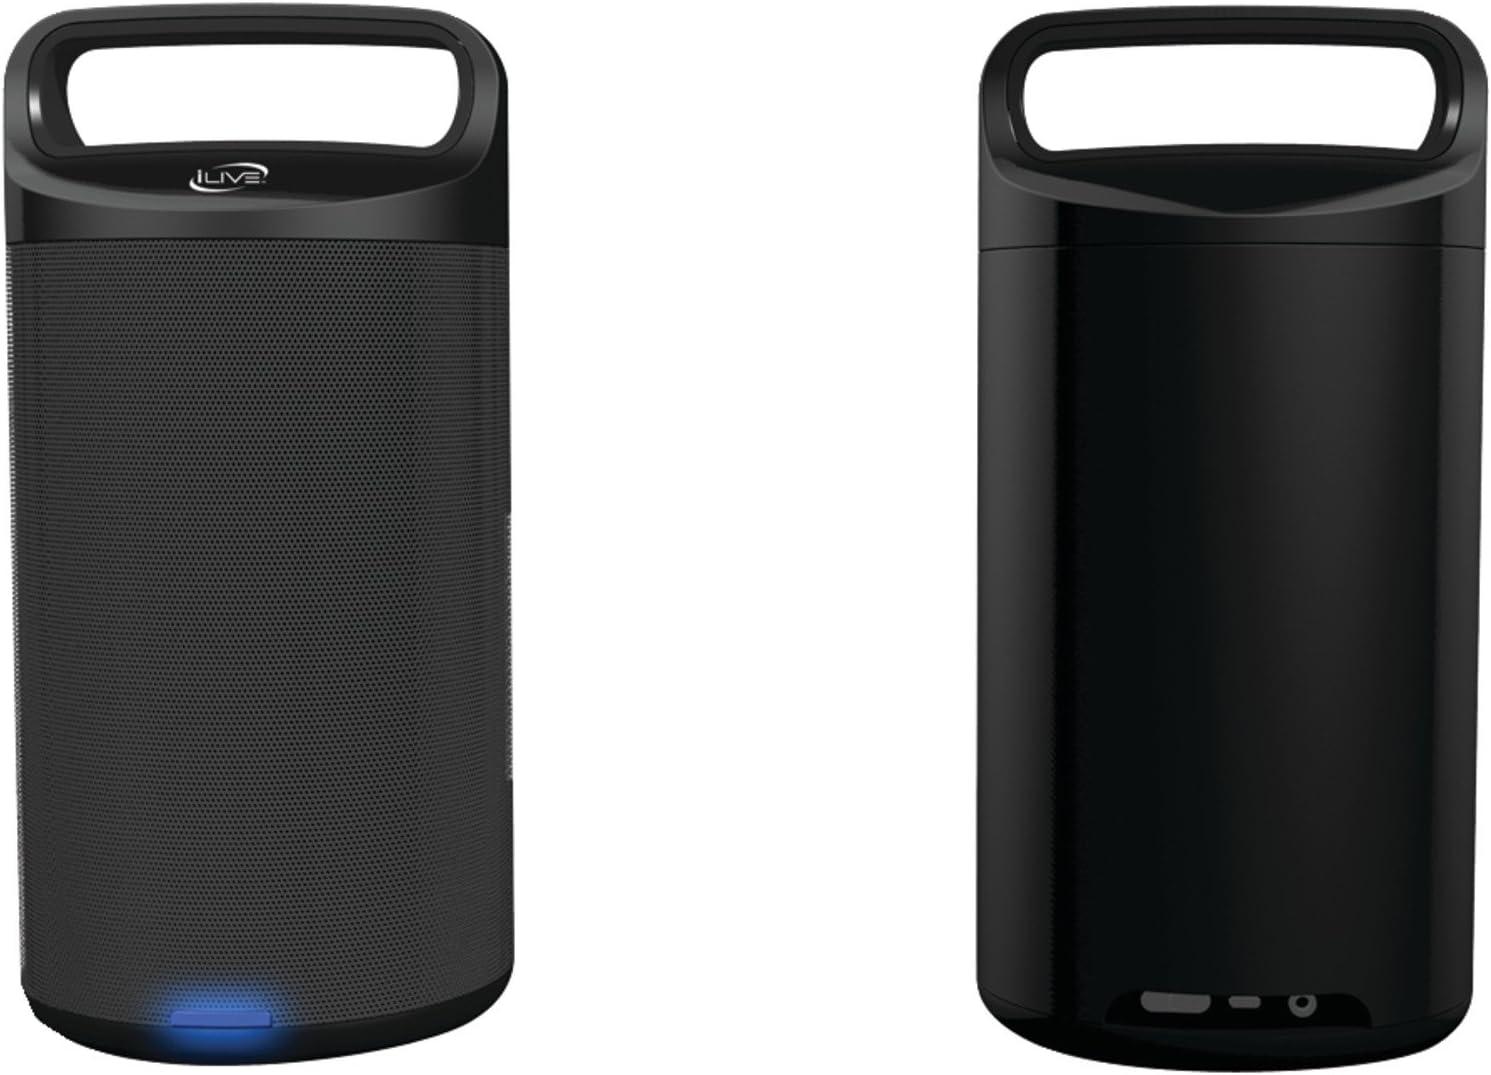 iLive ISBW2113B Portable Bluetooth Speakers